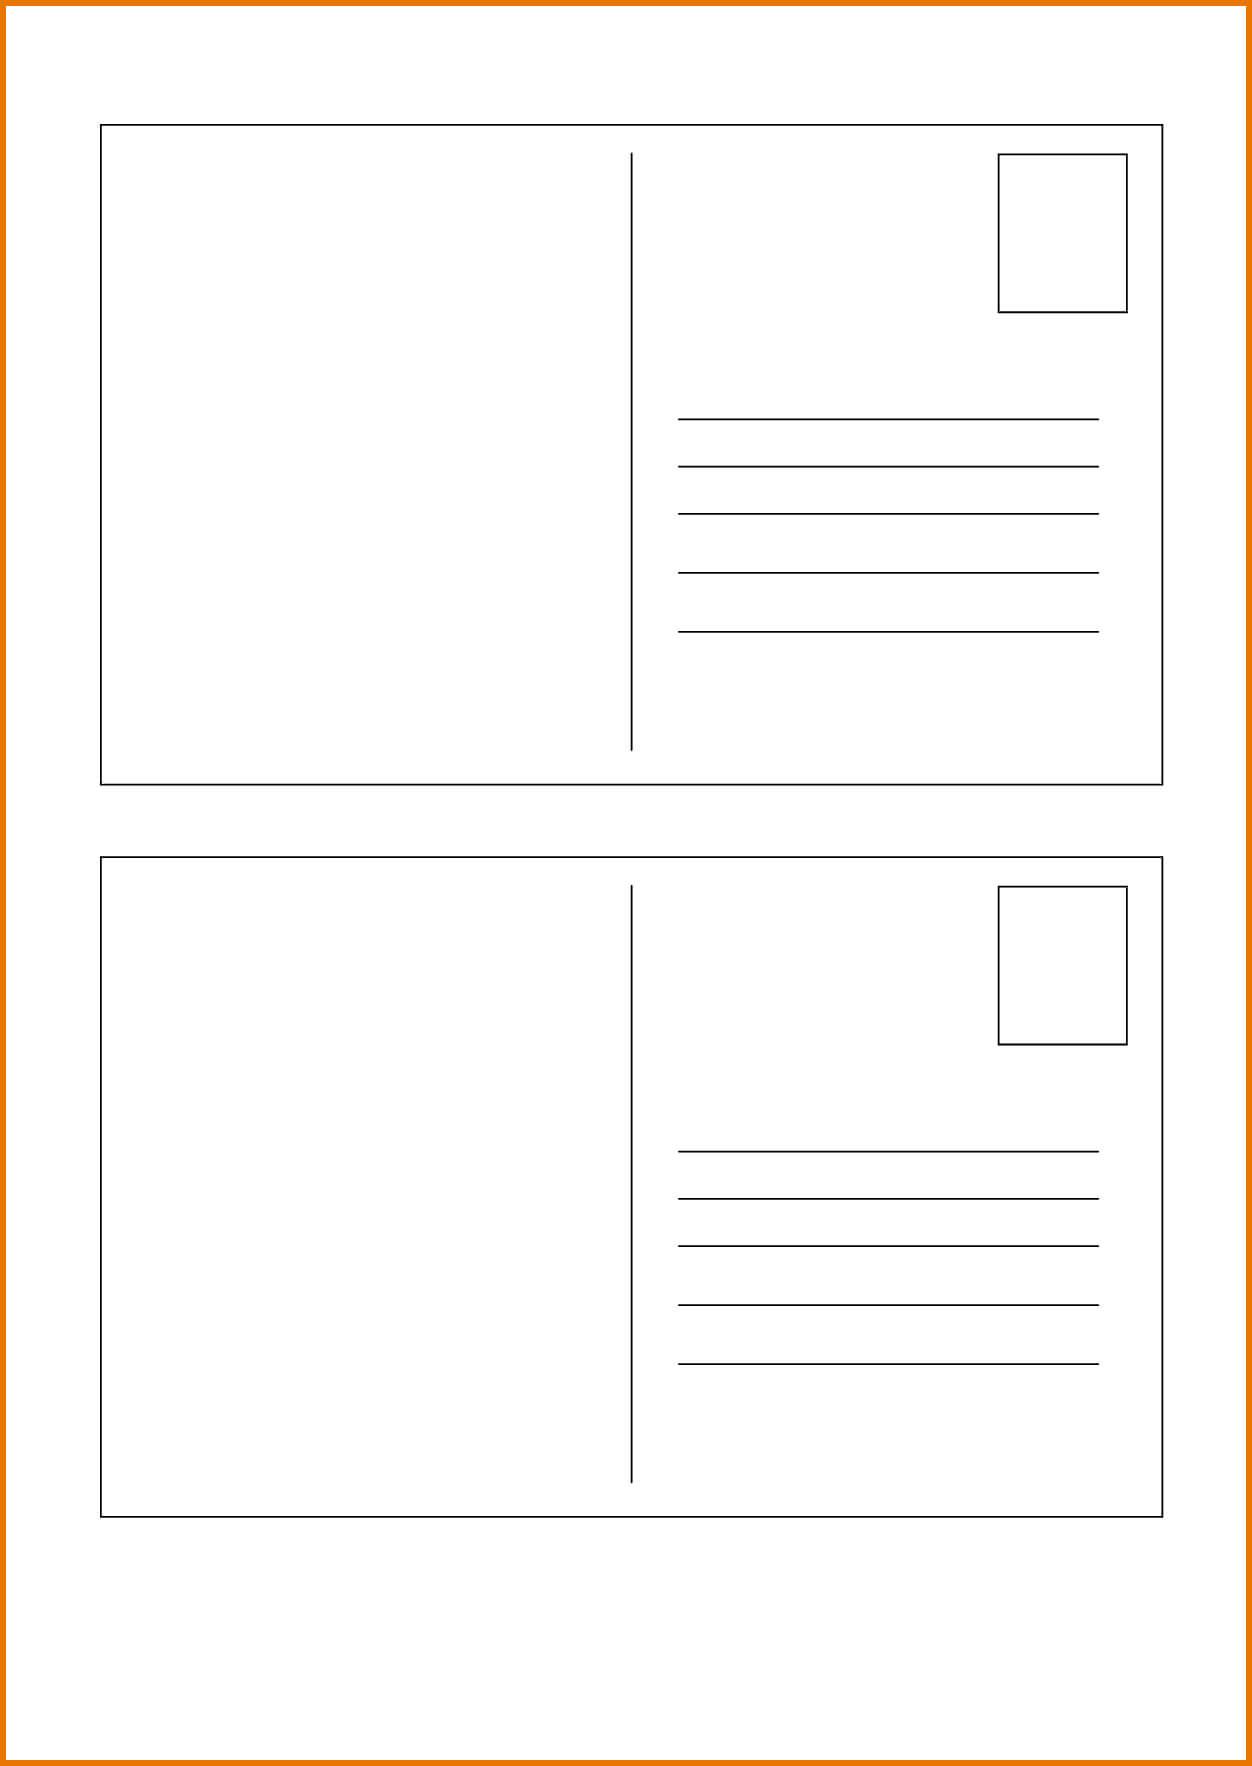 004 Blank Postcard Template Free Ideas Impressive 4X6 For Regarding Microsoft Word 4X6 Postcard Template